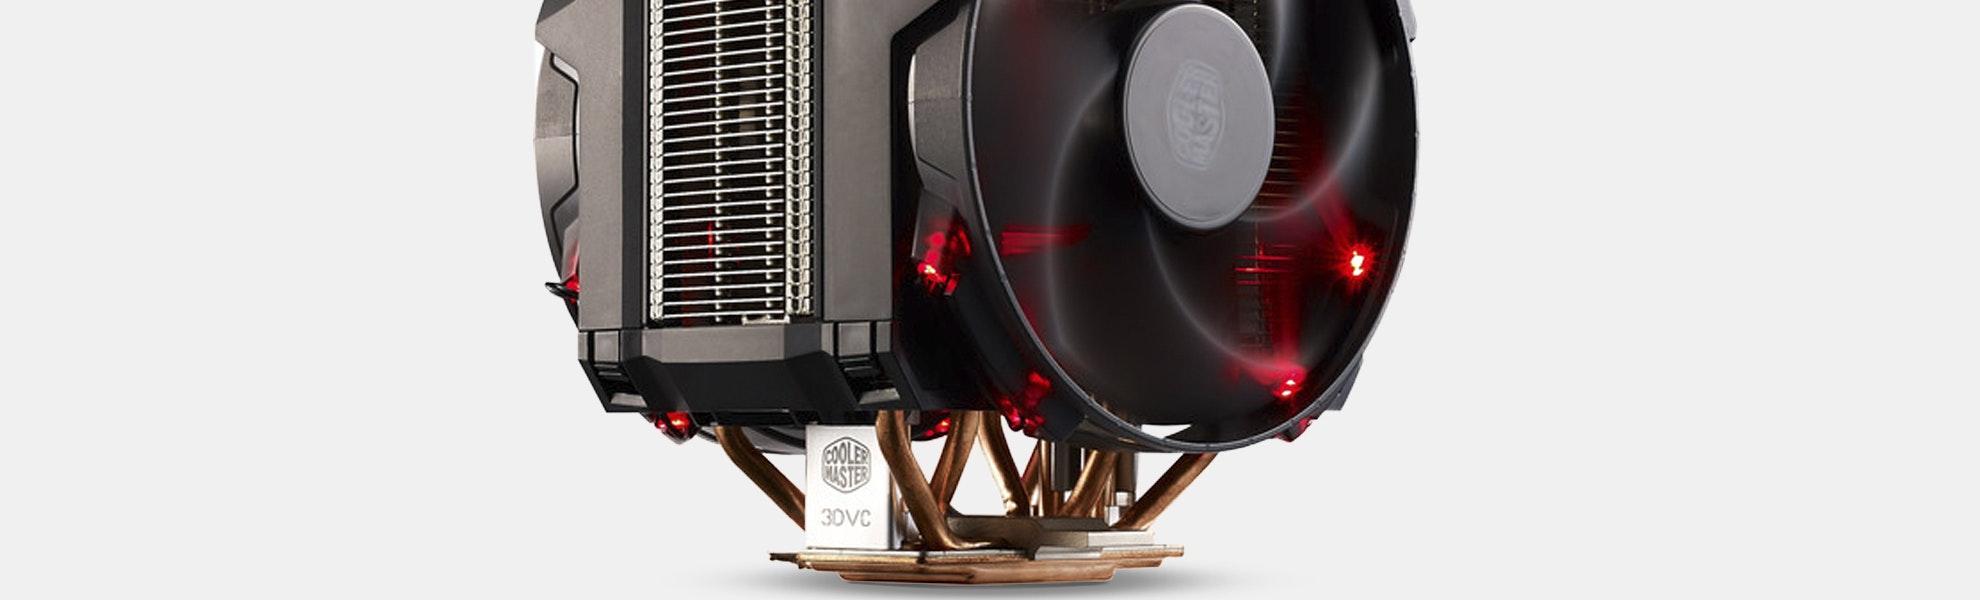 Cooler Master MasterAir Maker 8 CPU Air Cooler